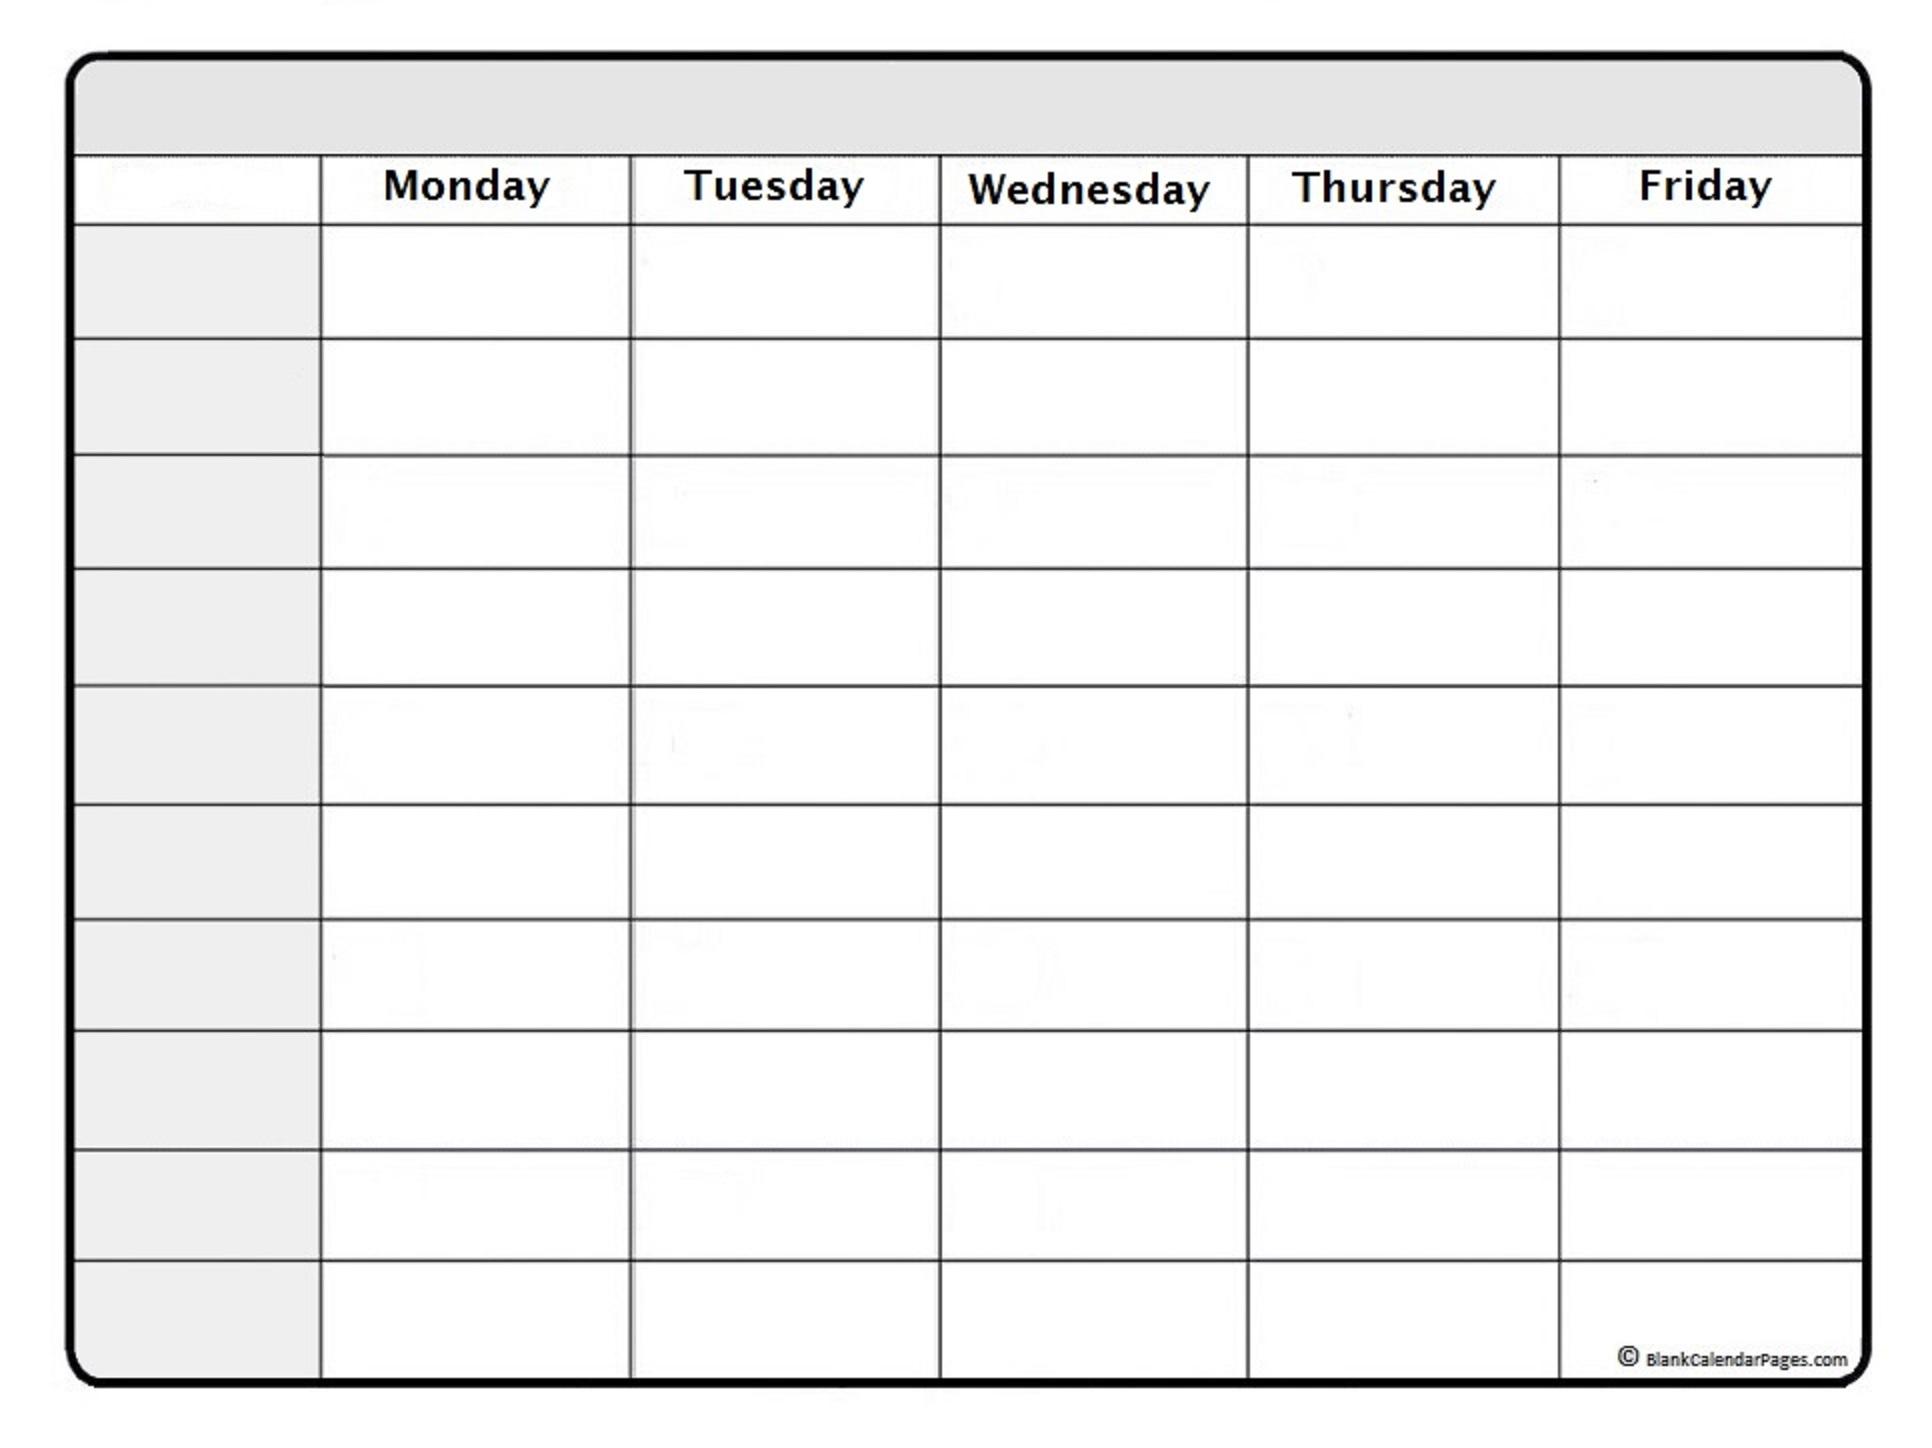 August 2019 Weekly Calendar Template